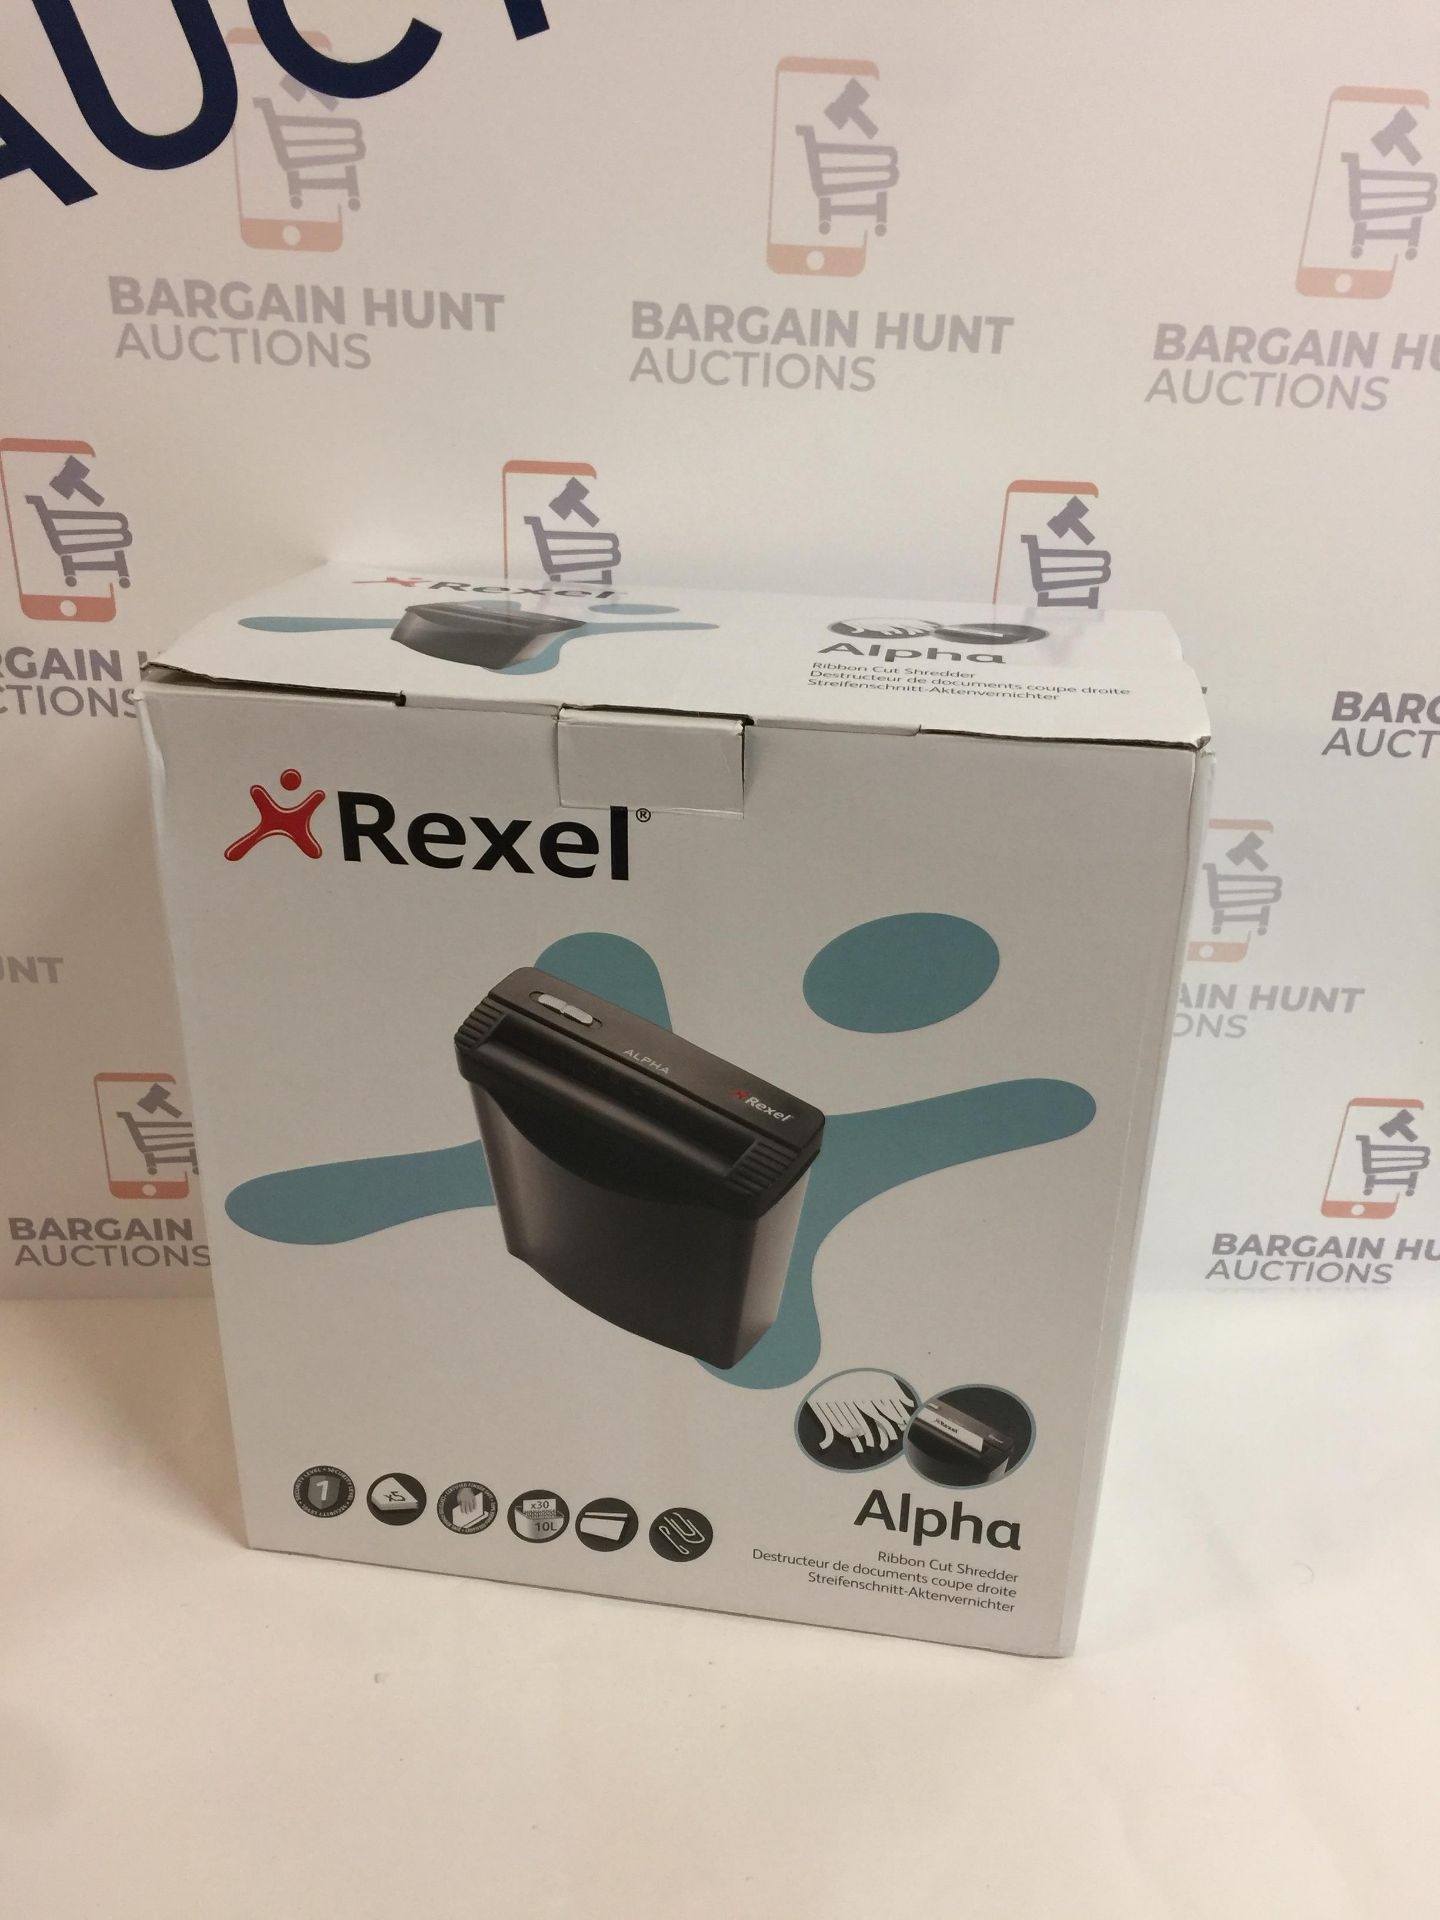 Lotto 12 - Rexel 1202020 Alpha Ribbon Cut Shredder